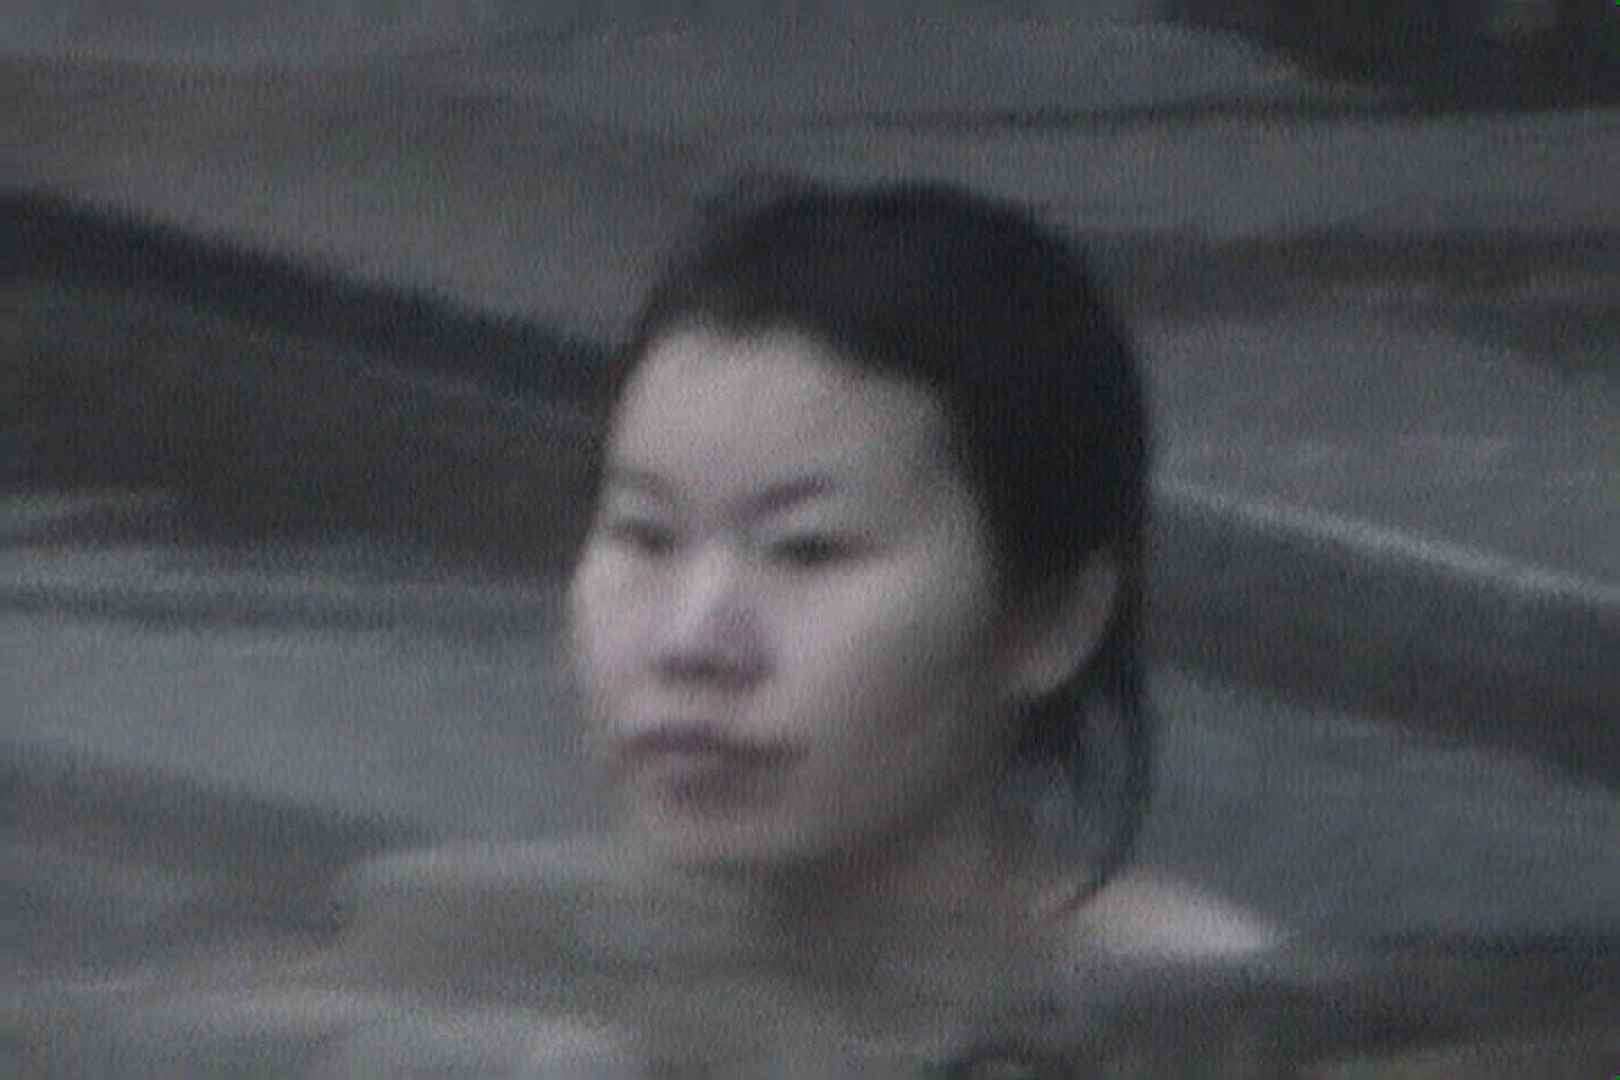 Aquaな露天風呂Vol.556 美しいOLの裸体 すけべAV動画紹介 69pic 5